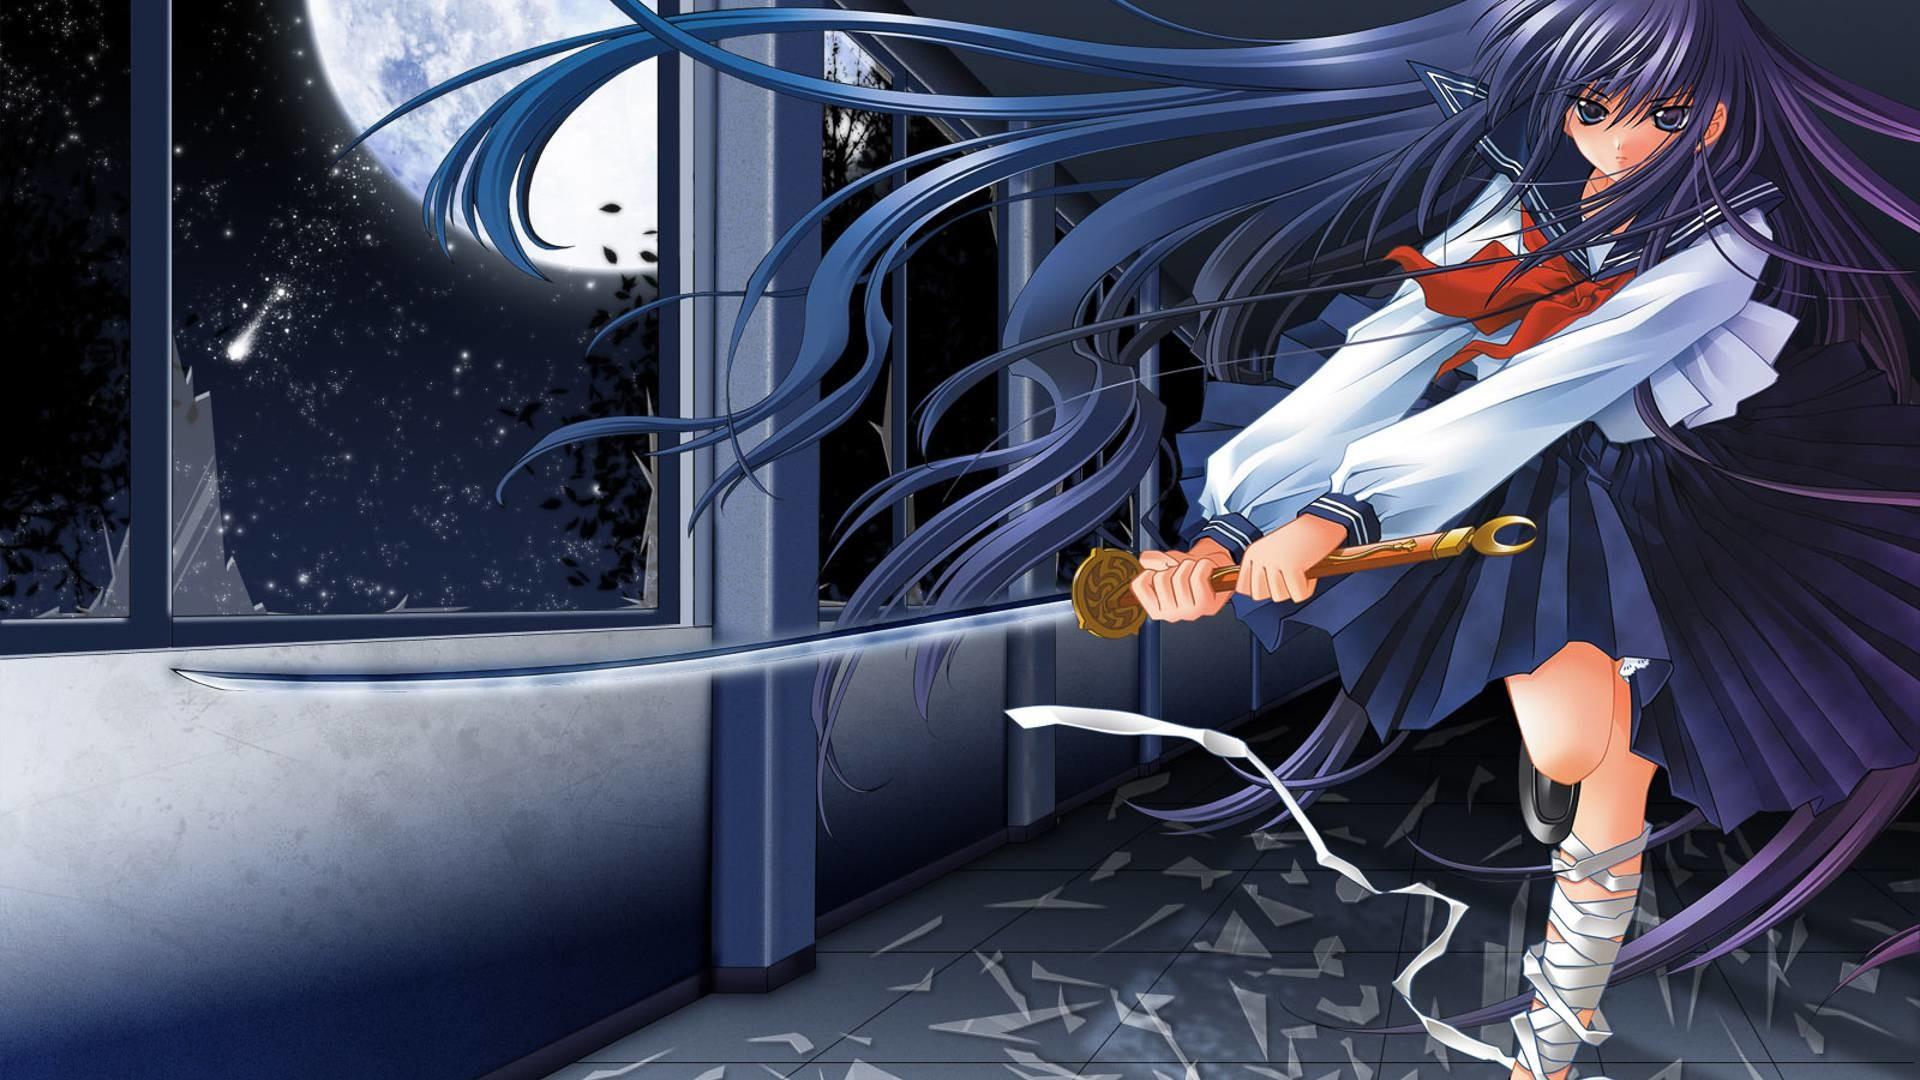 Pin Anime Samurai Girl Wallpaper Hd Wallpapers Desktop Kootation Com .